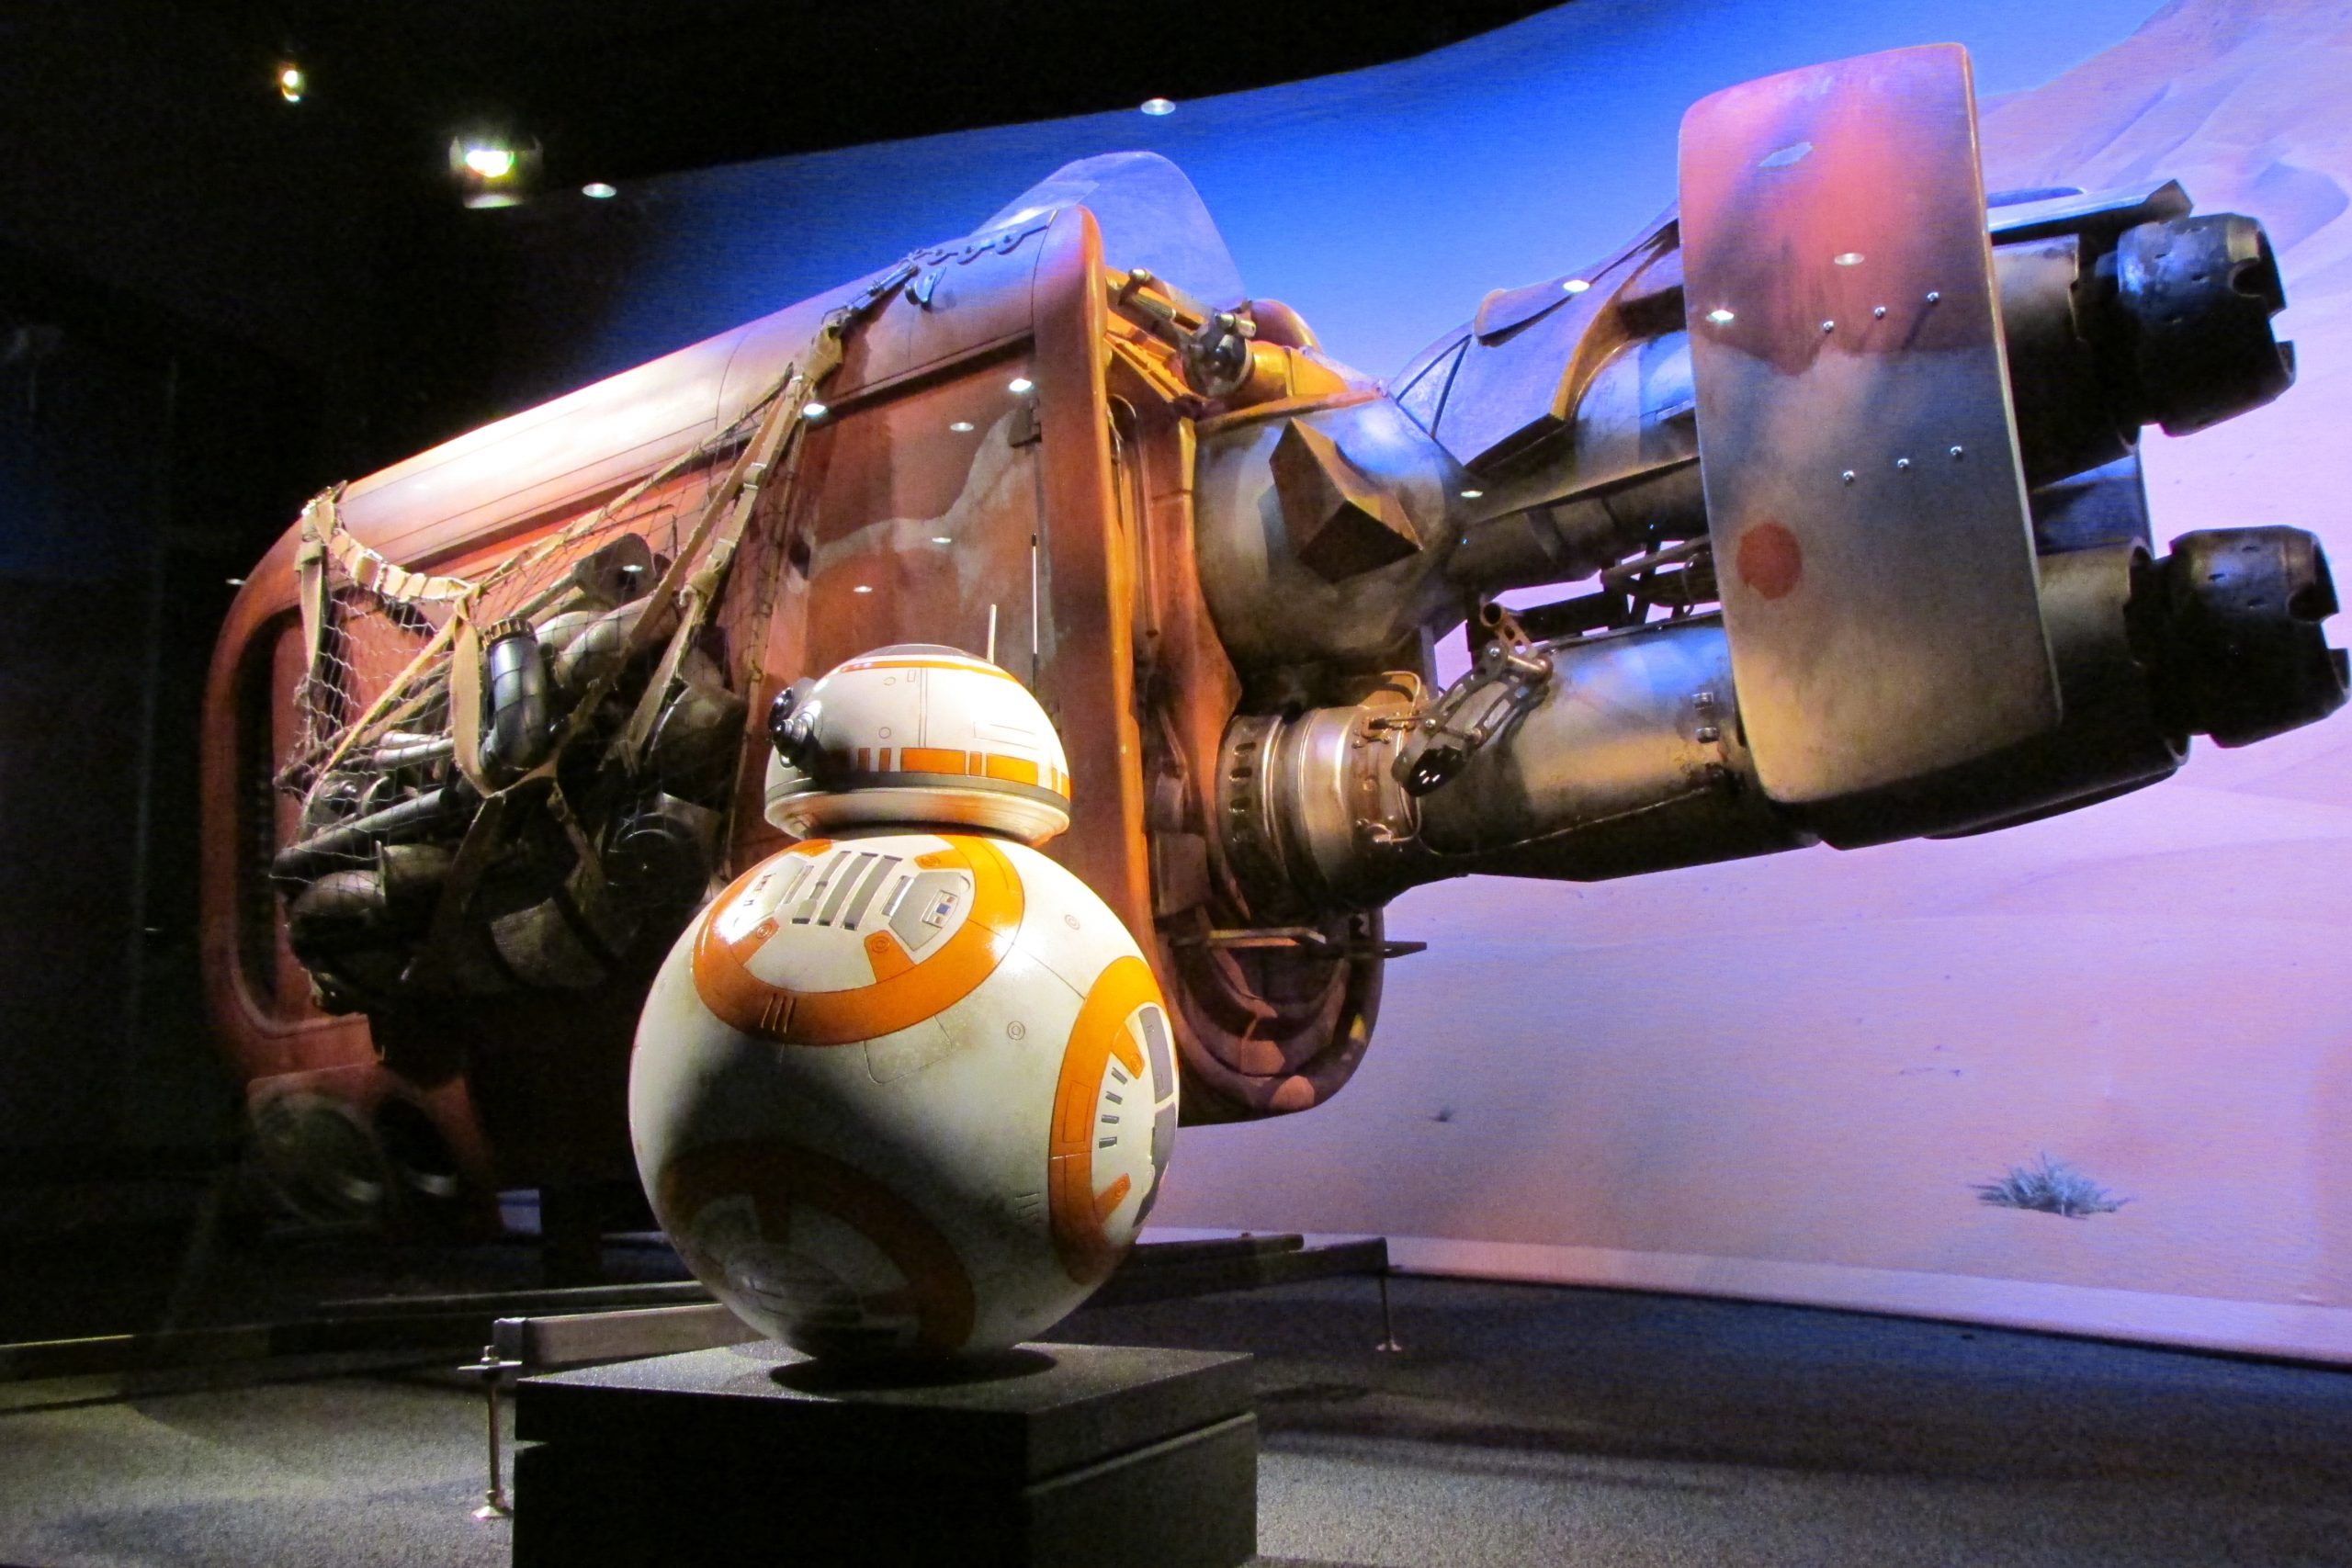 bb-8 at Star Wars Launch Bay - Hollywood Studios - Disney World